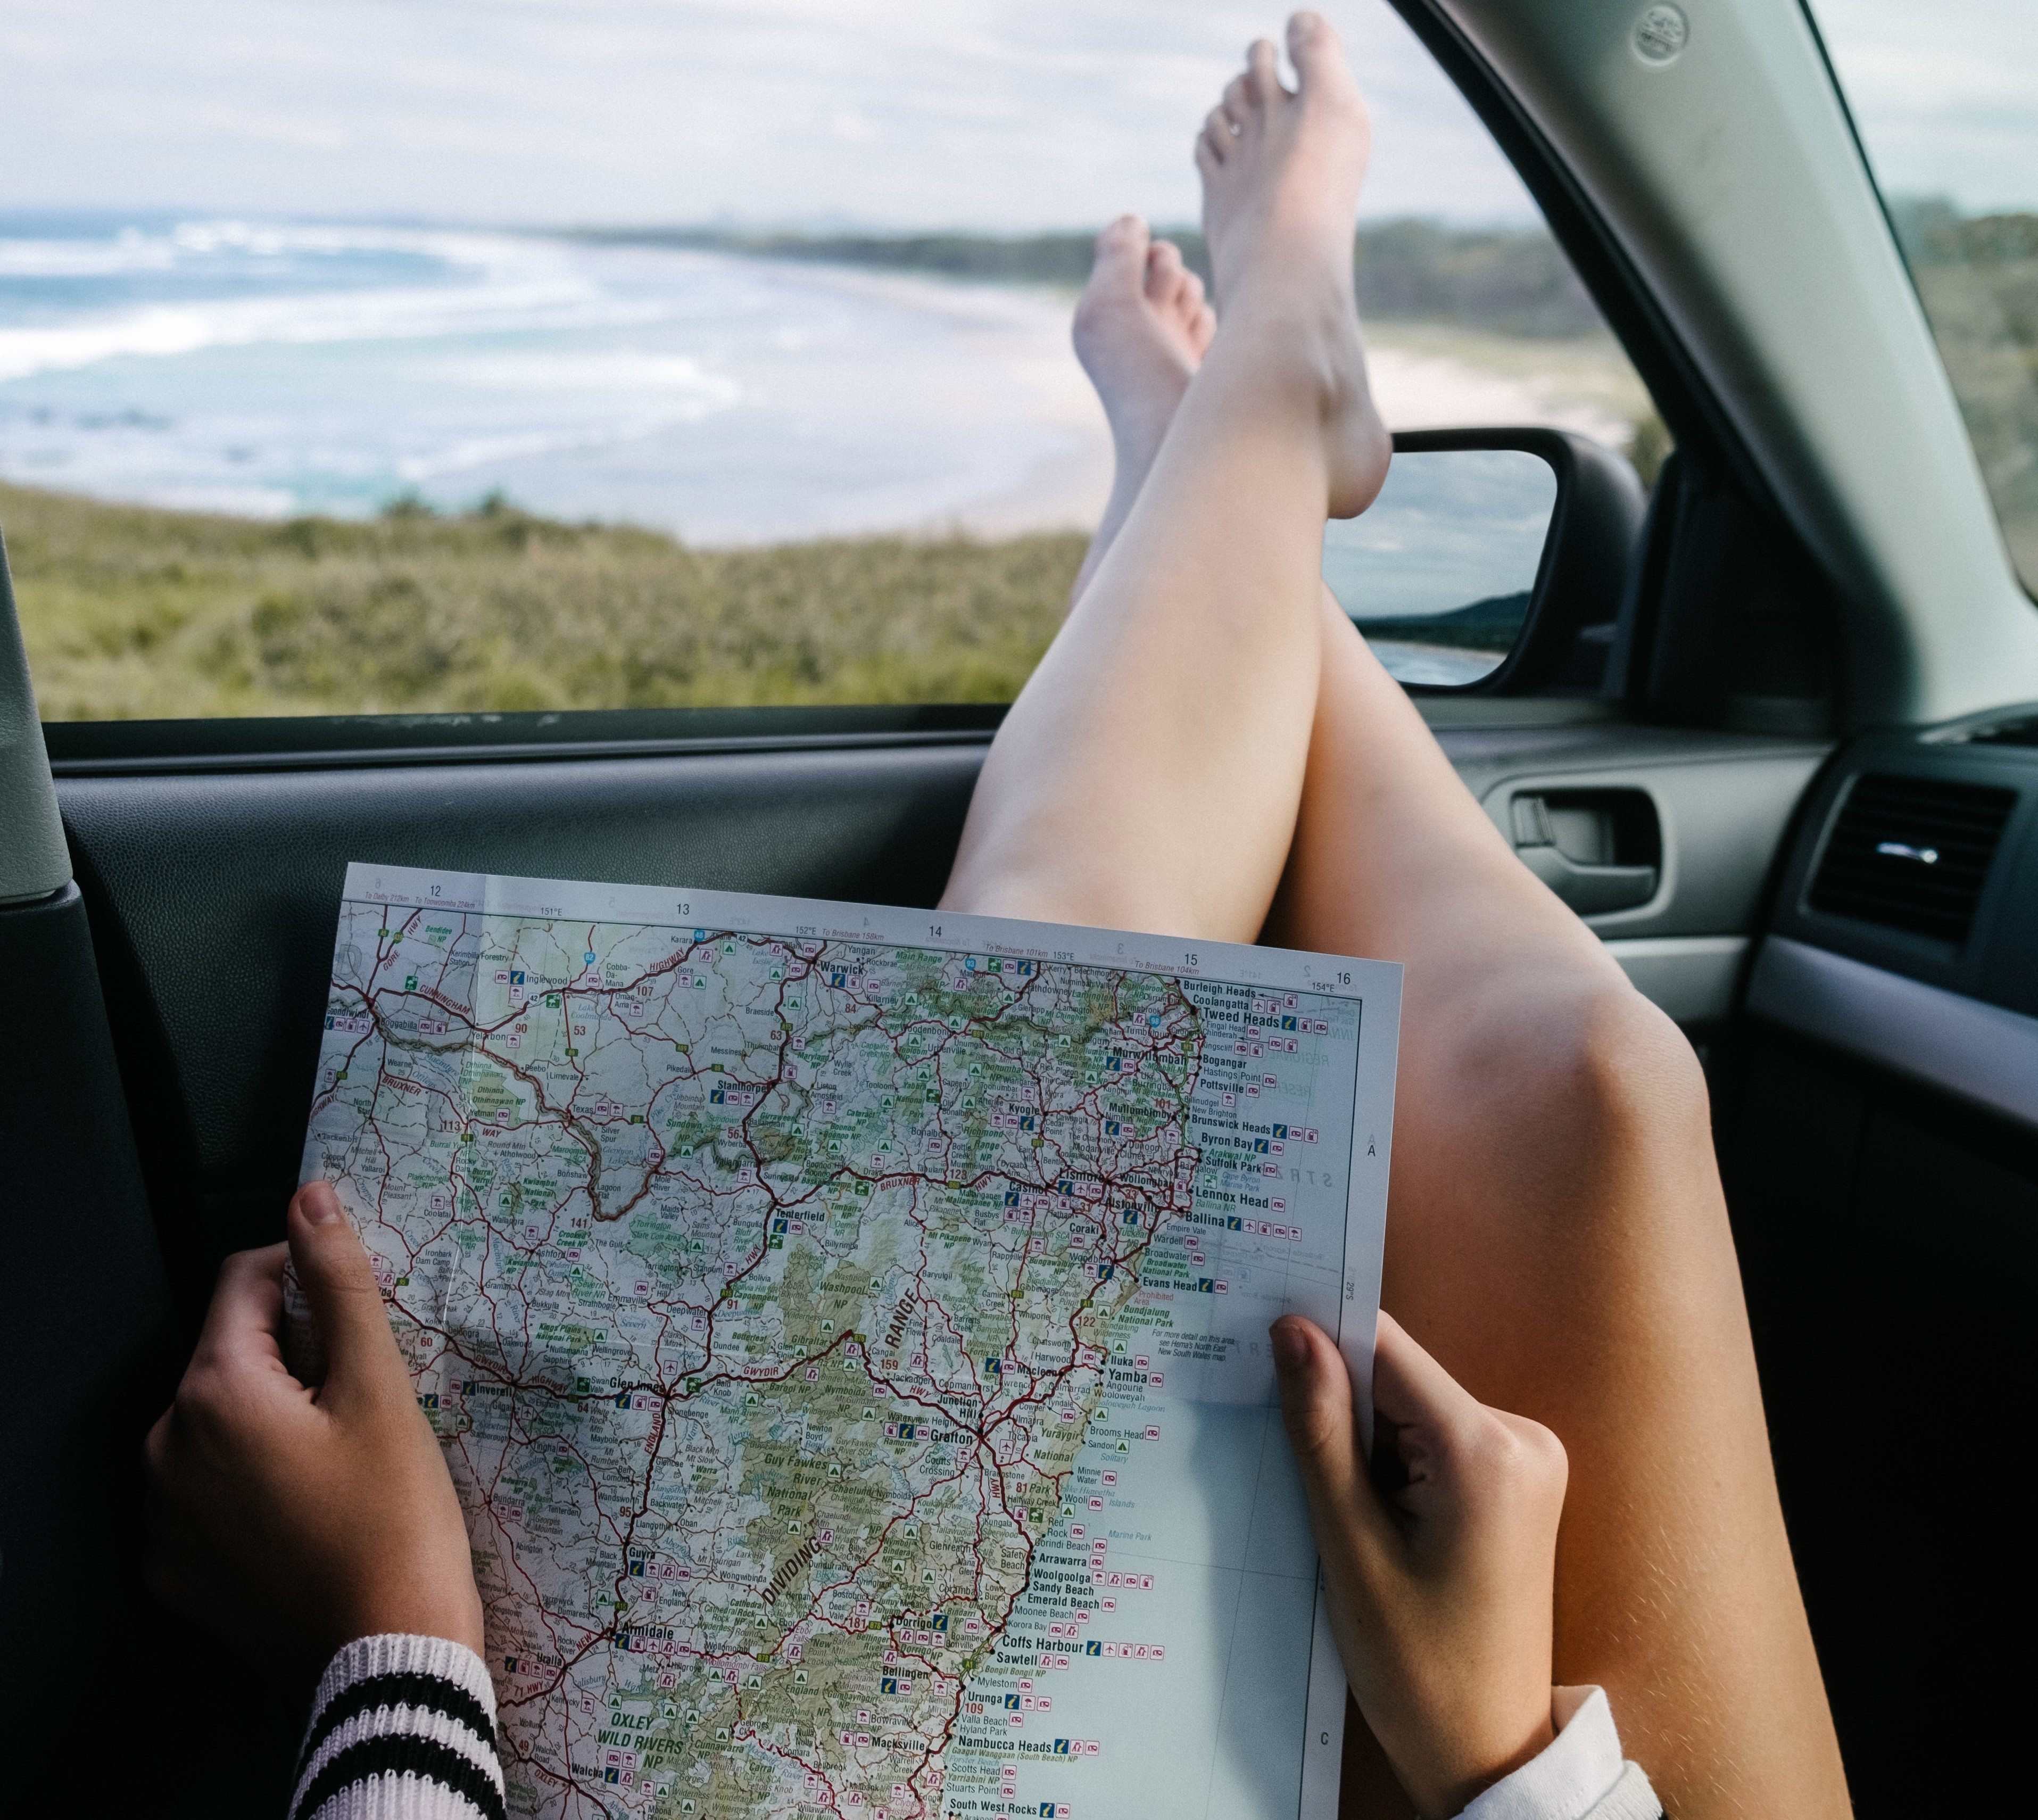 viagem road trip mapa